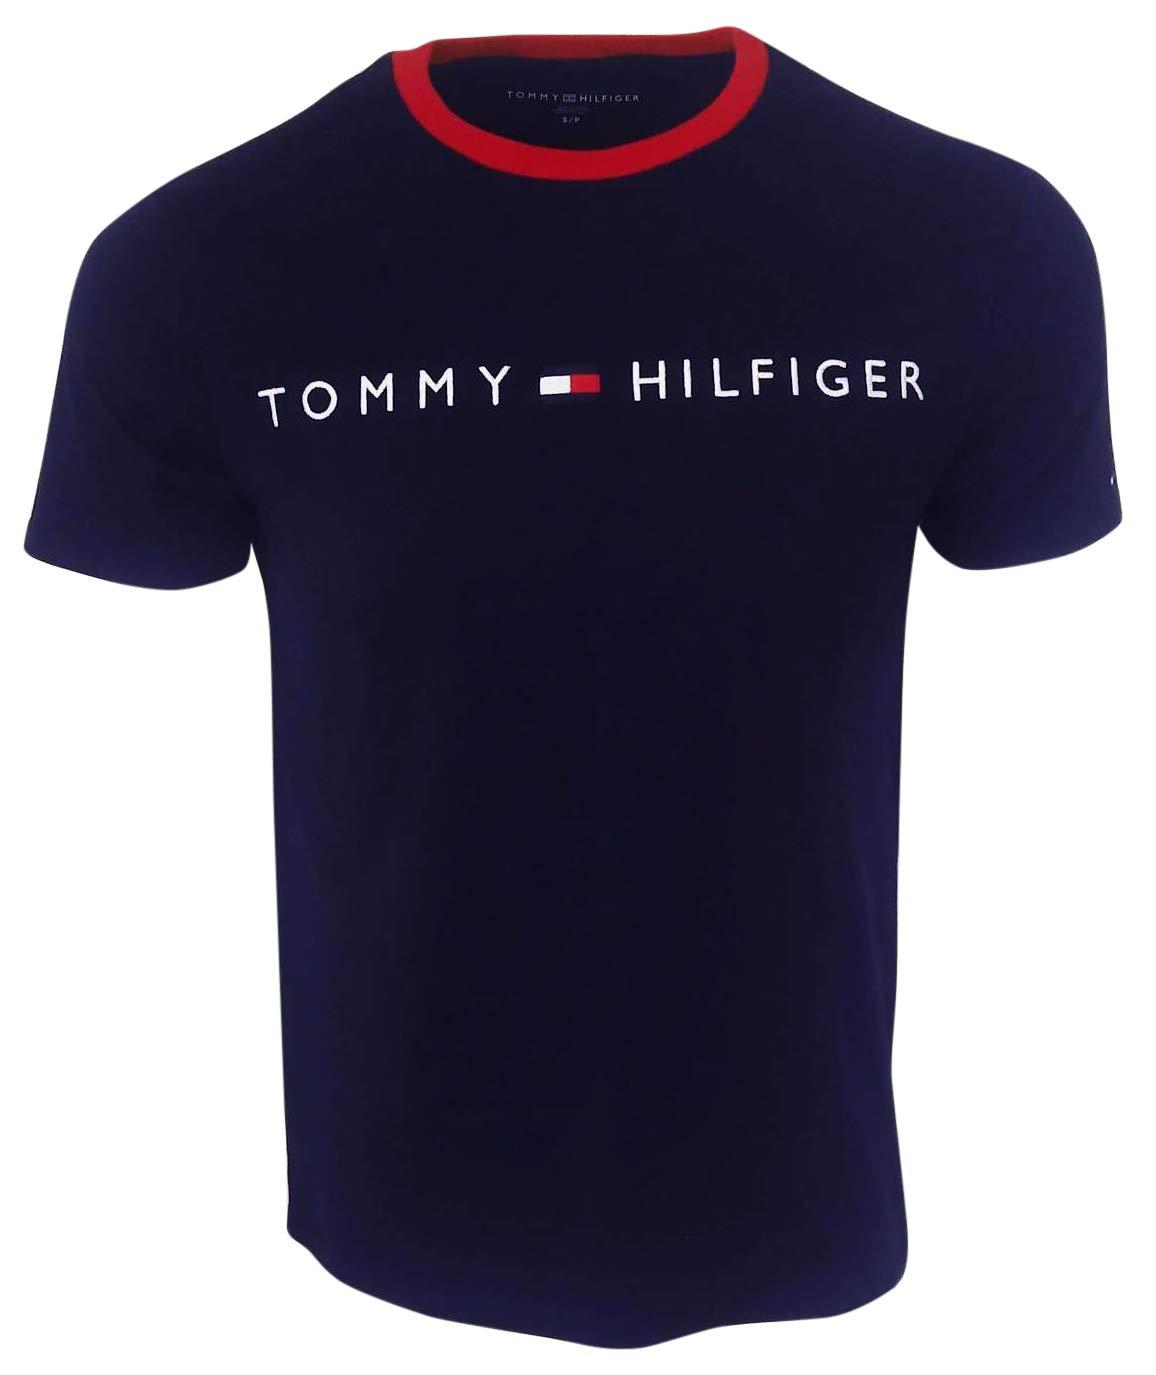 Tommy Hilfiger Men's New Line Crewneck T-Shirt (Small, Navy)